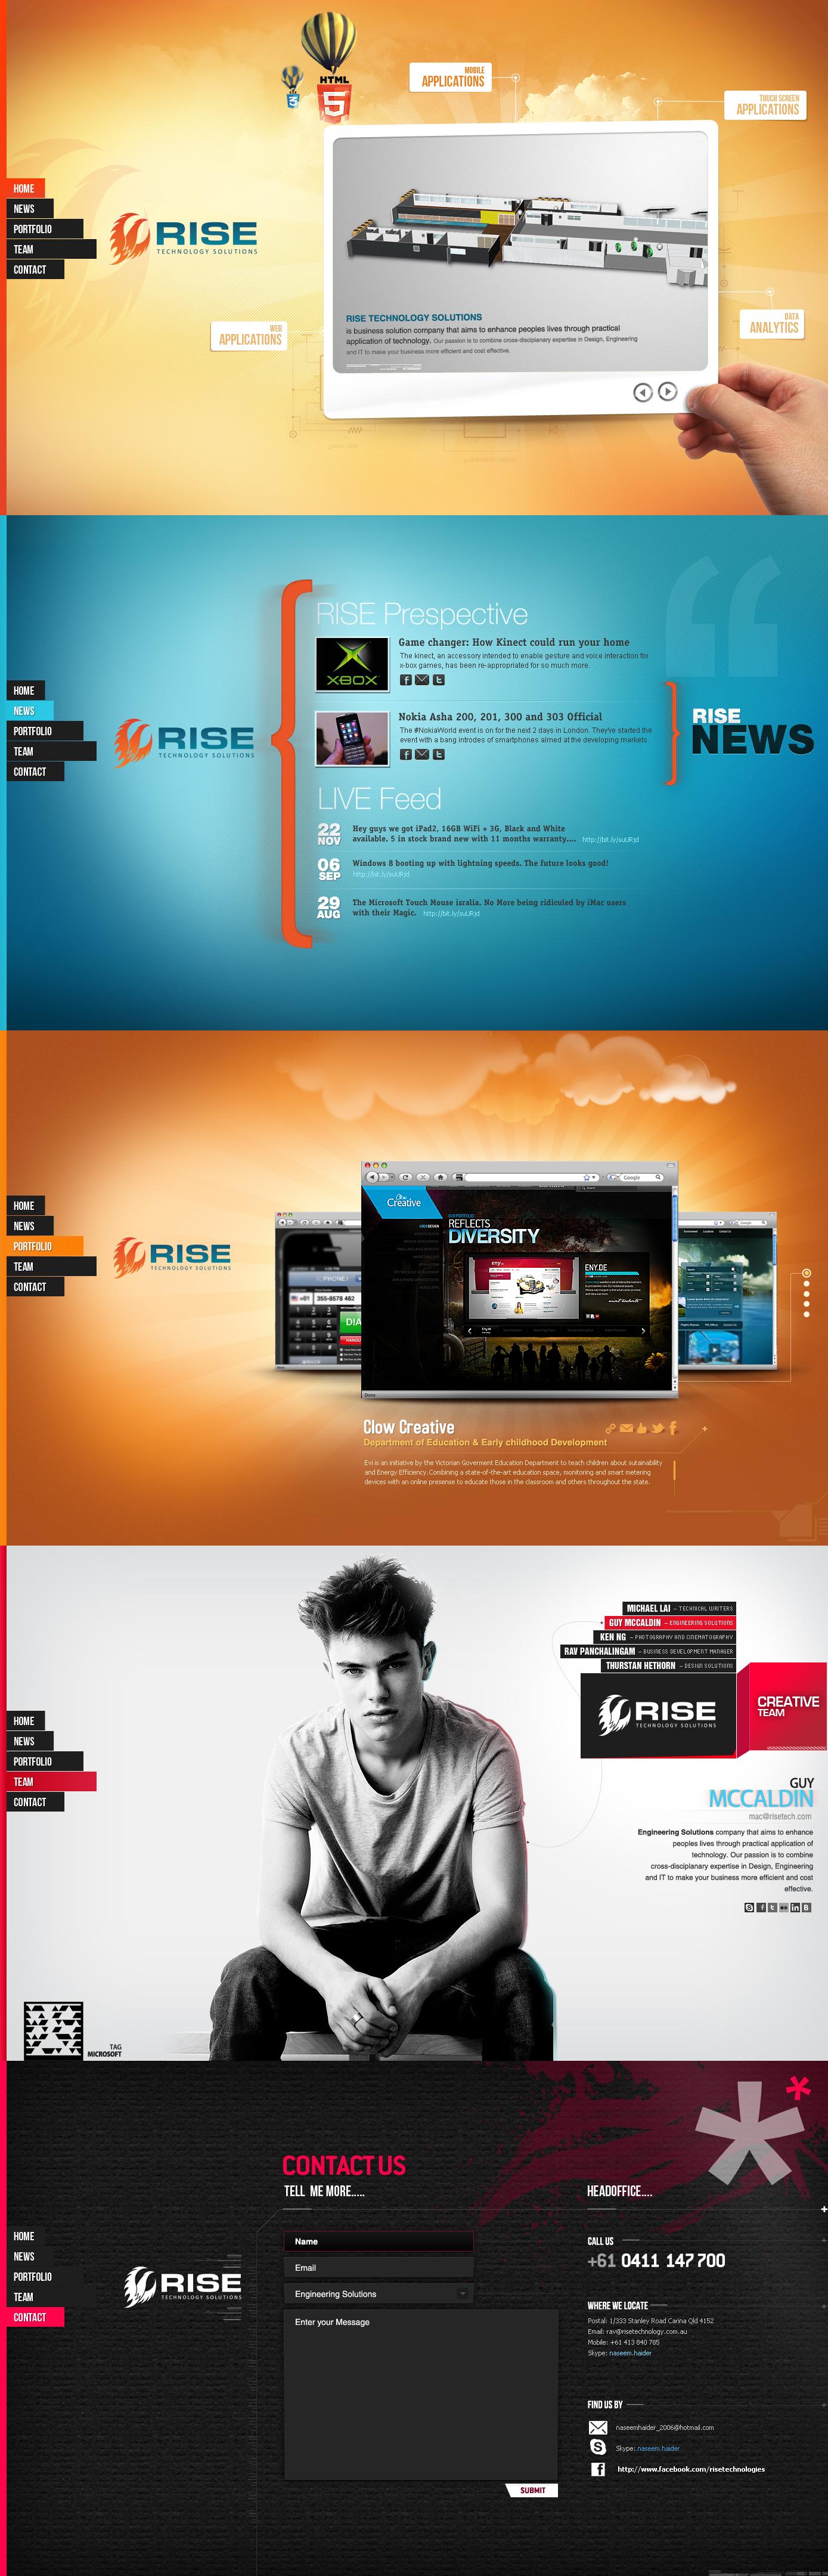 Rise Technologies Html 5 By Naseemhaider On Deviantart Web Design Web Development Design Web Design Inspiration